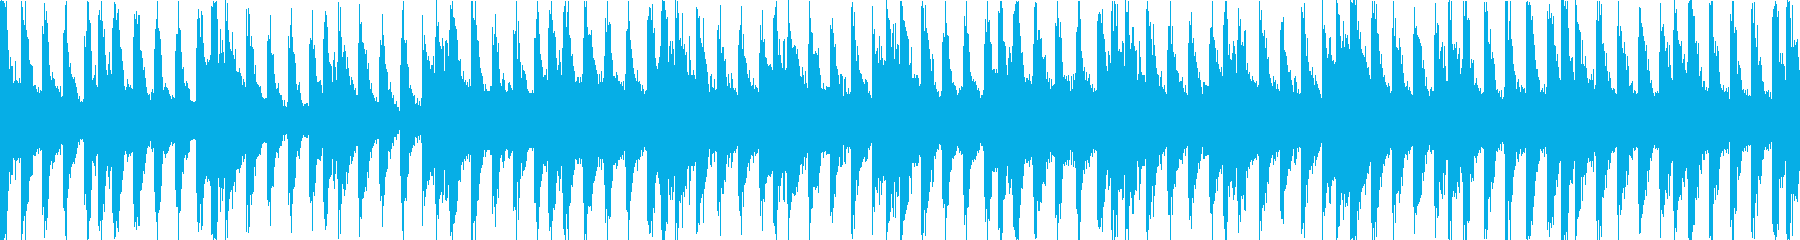 FFボス戦風、疾走感、戦闘バトルループcの再生済みの波形